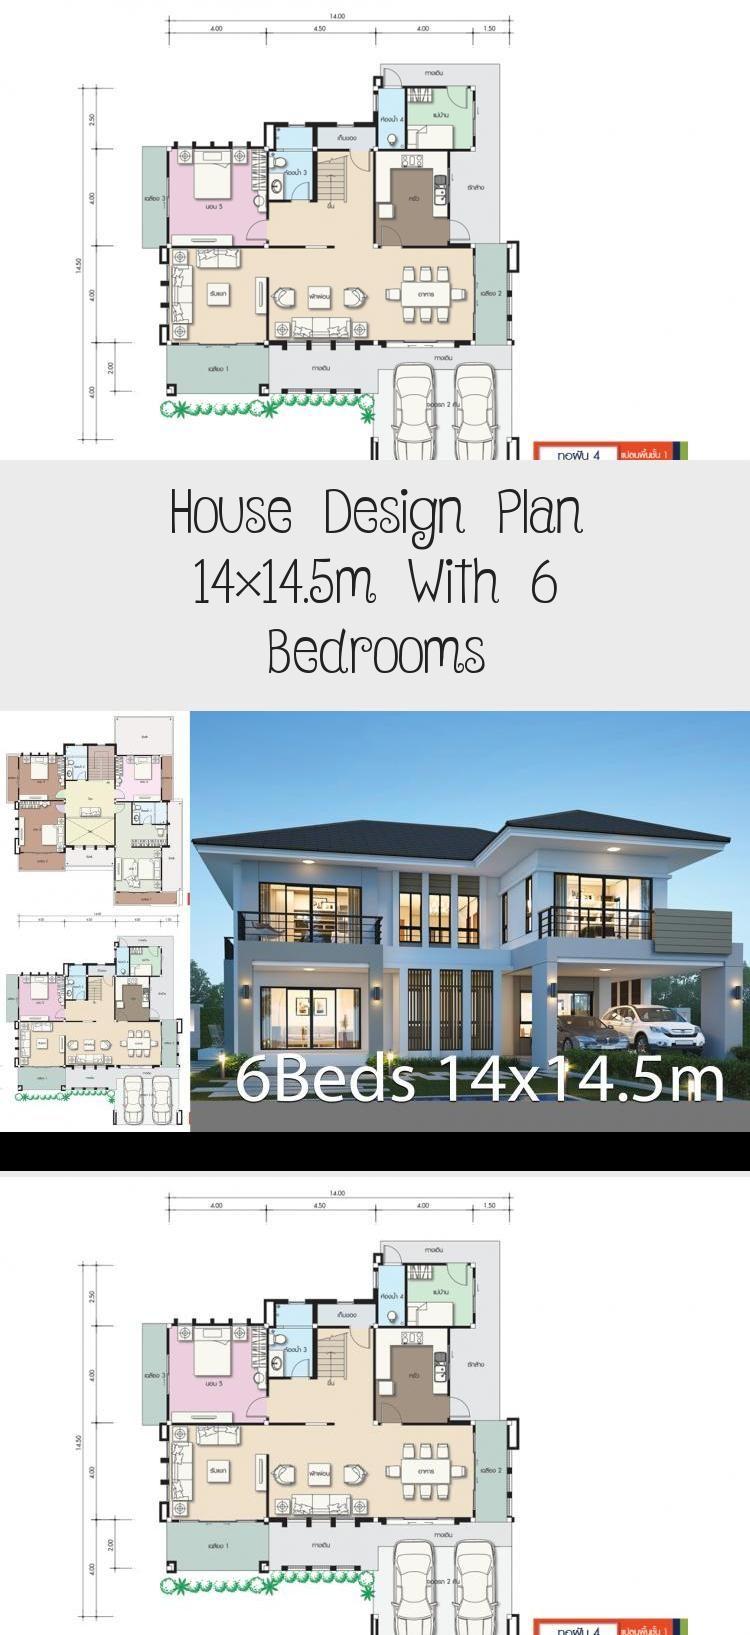 House Design Plan 14x14 5m With 6 Bedrooms Home Design With Plansearch Uniquehouseplans Largehousepla In 2020 Home Design Plans Unique House Plans Sims House Plans